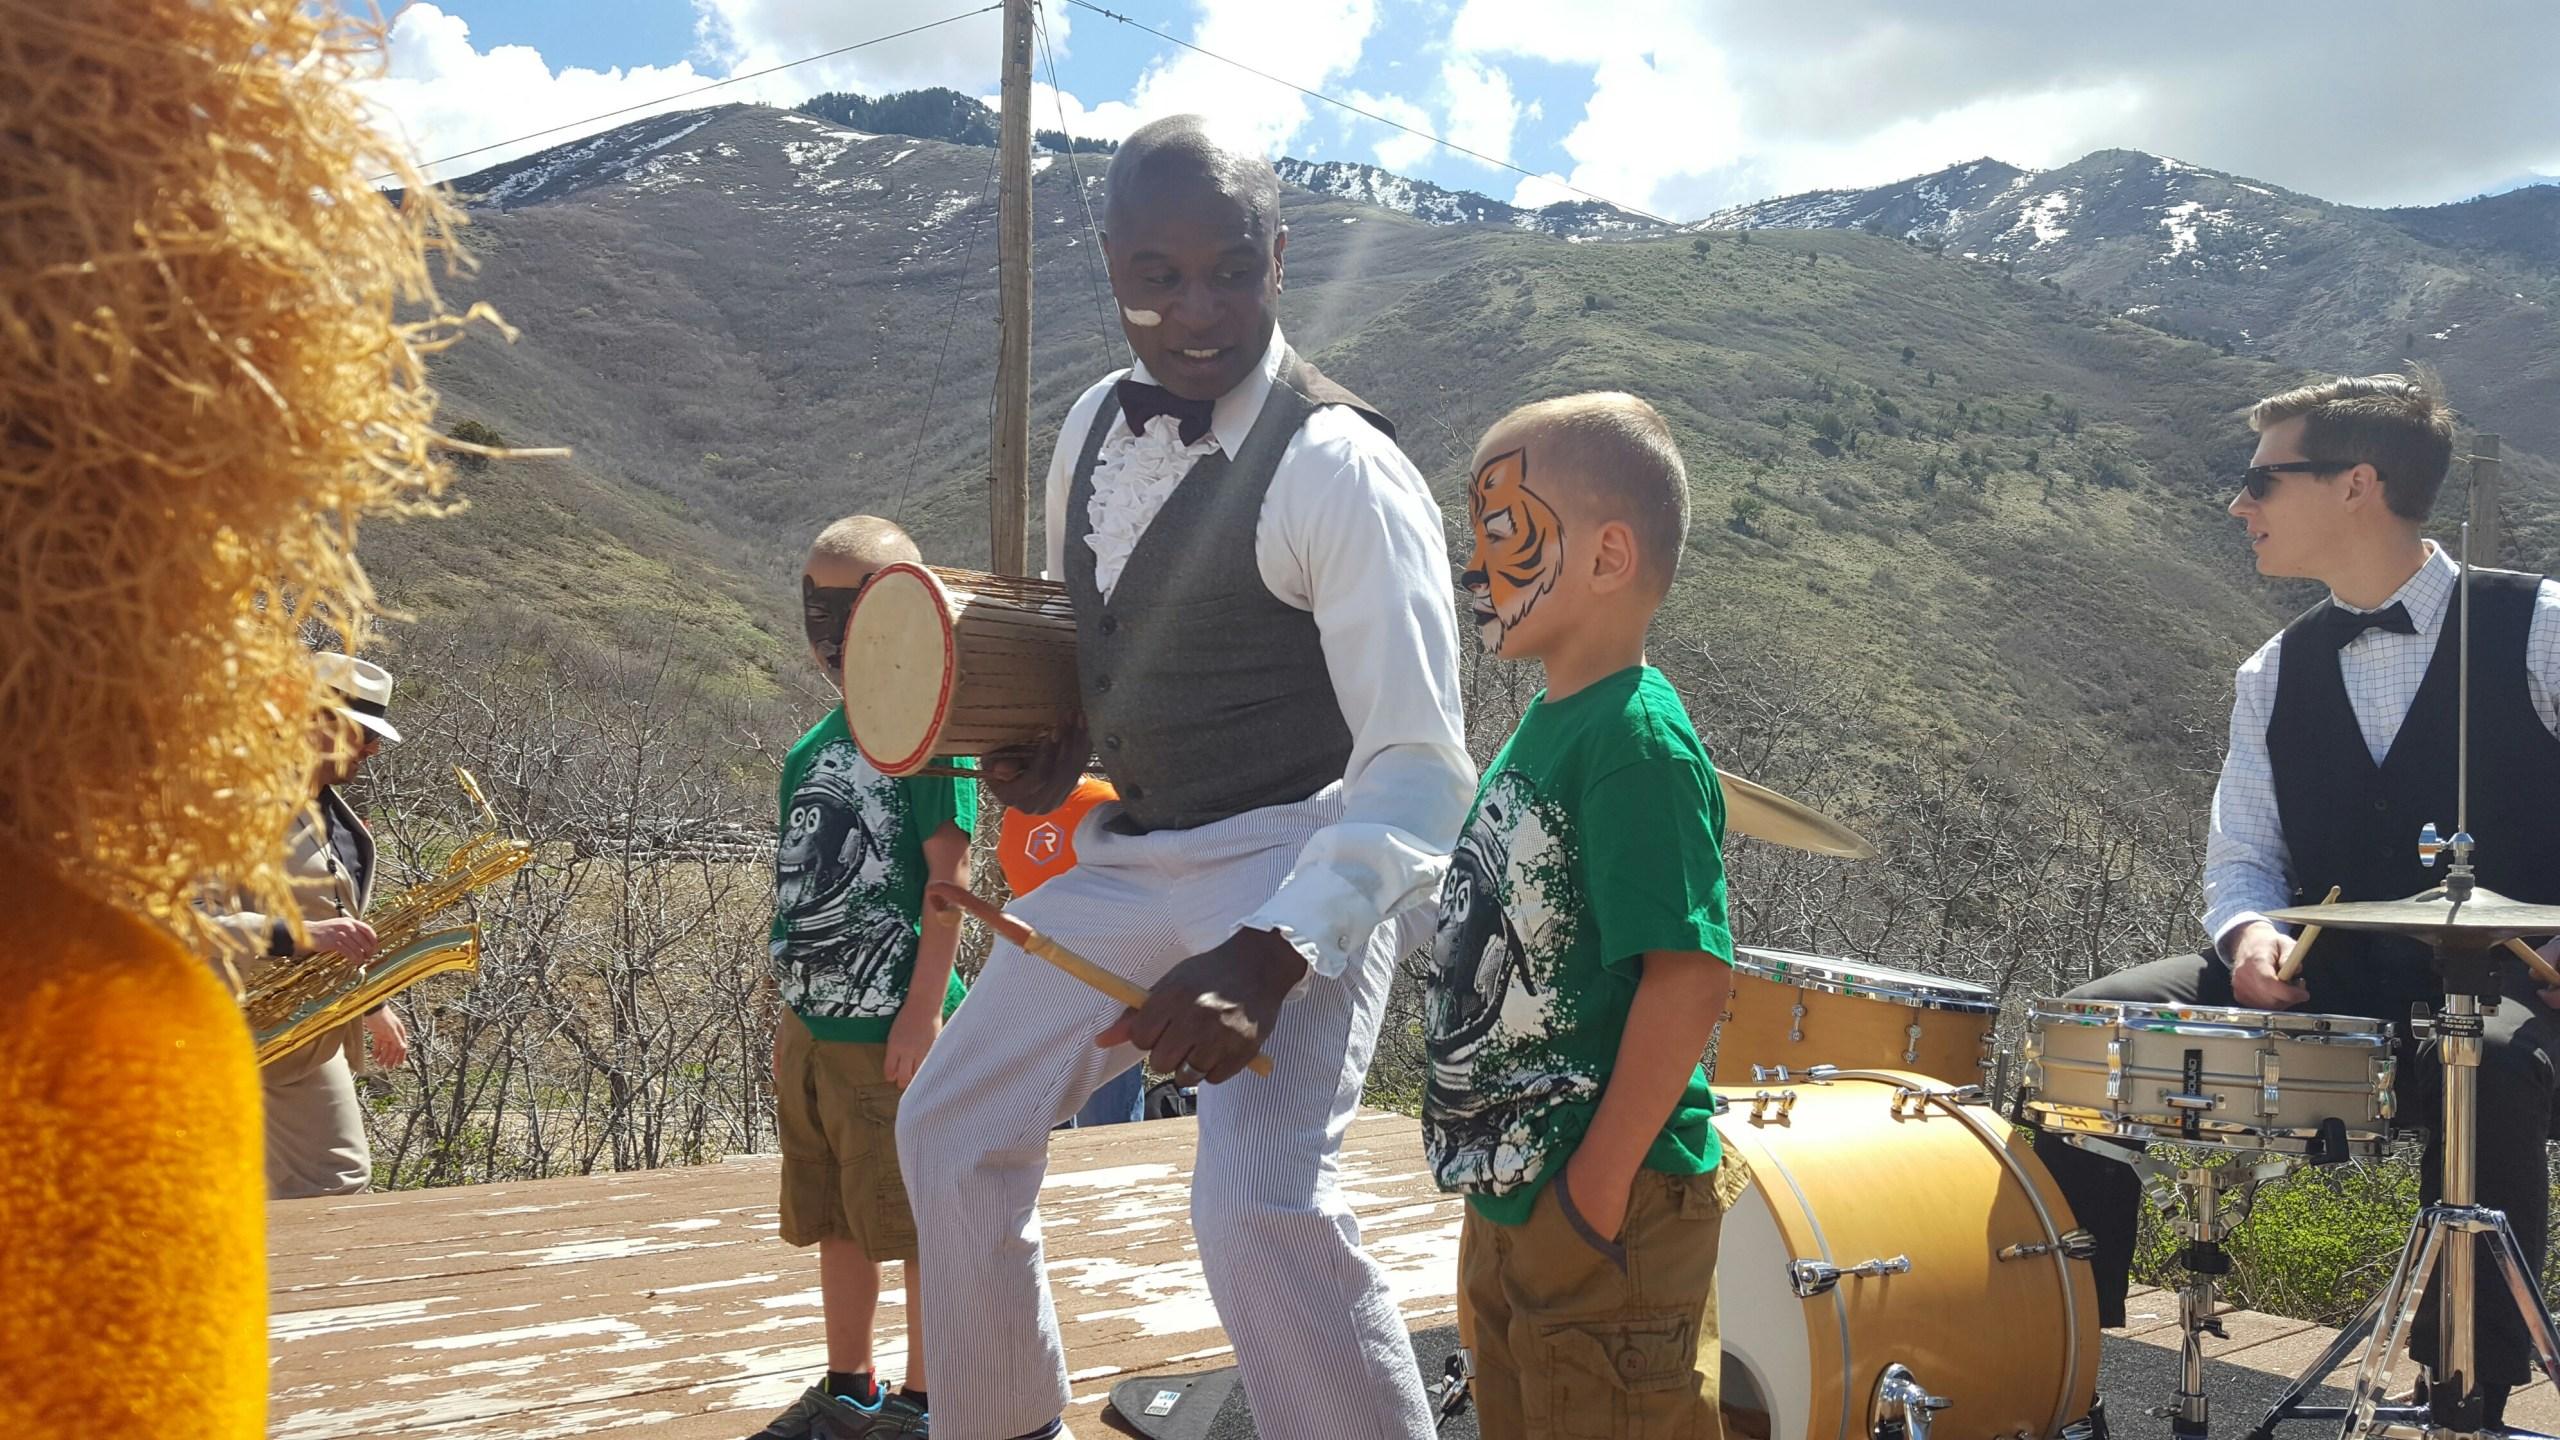 Camp K Jungle Book Video Shoot - Alex Boye and the Divricean Boys_1460681497853.jpg